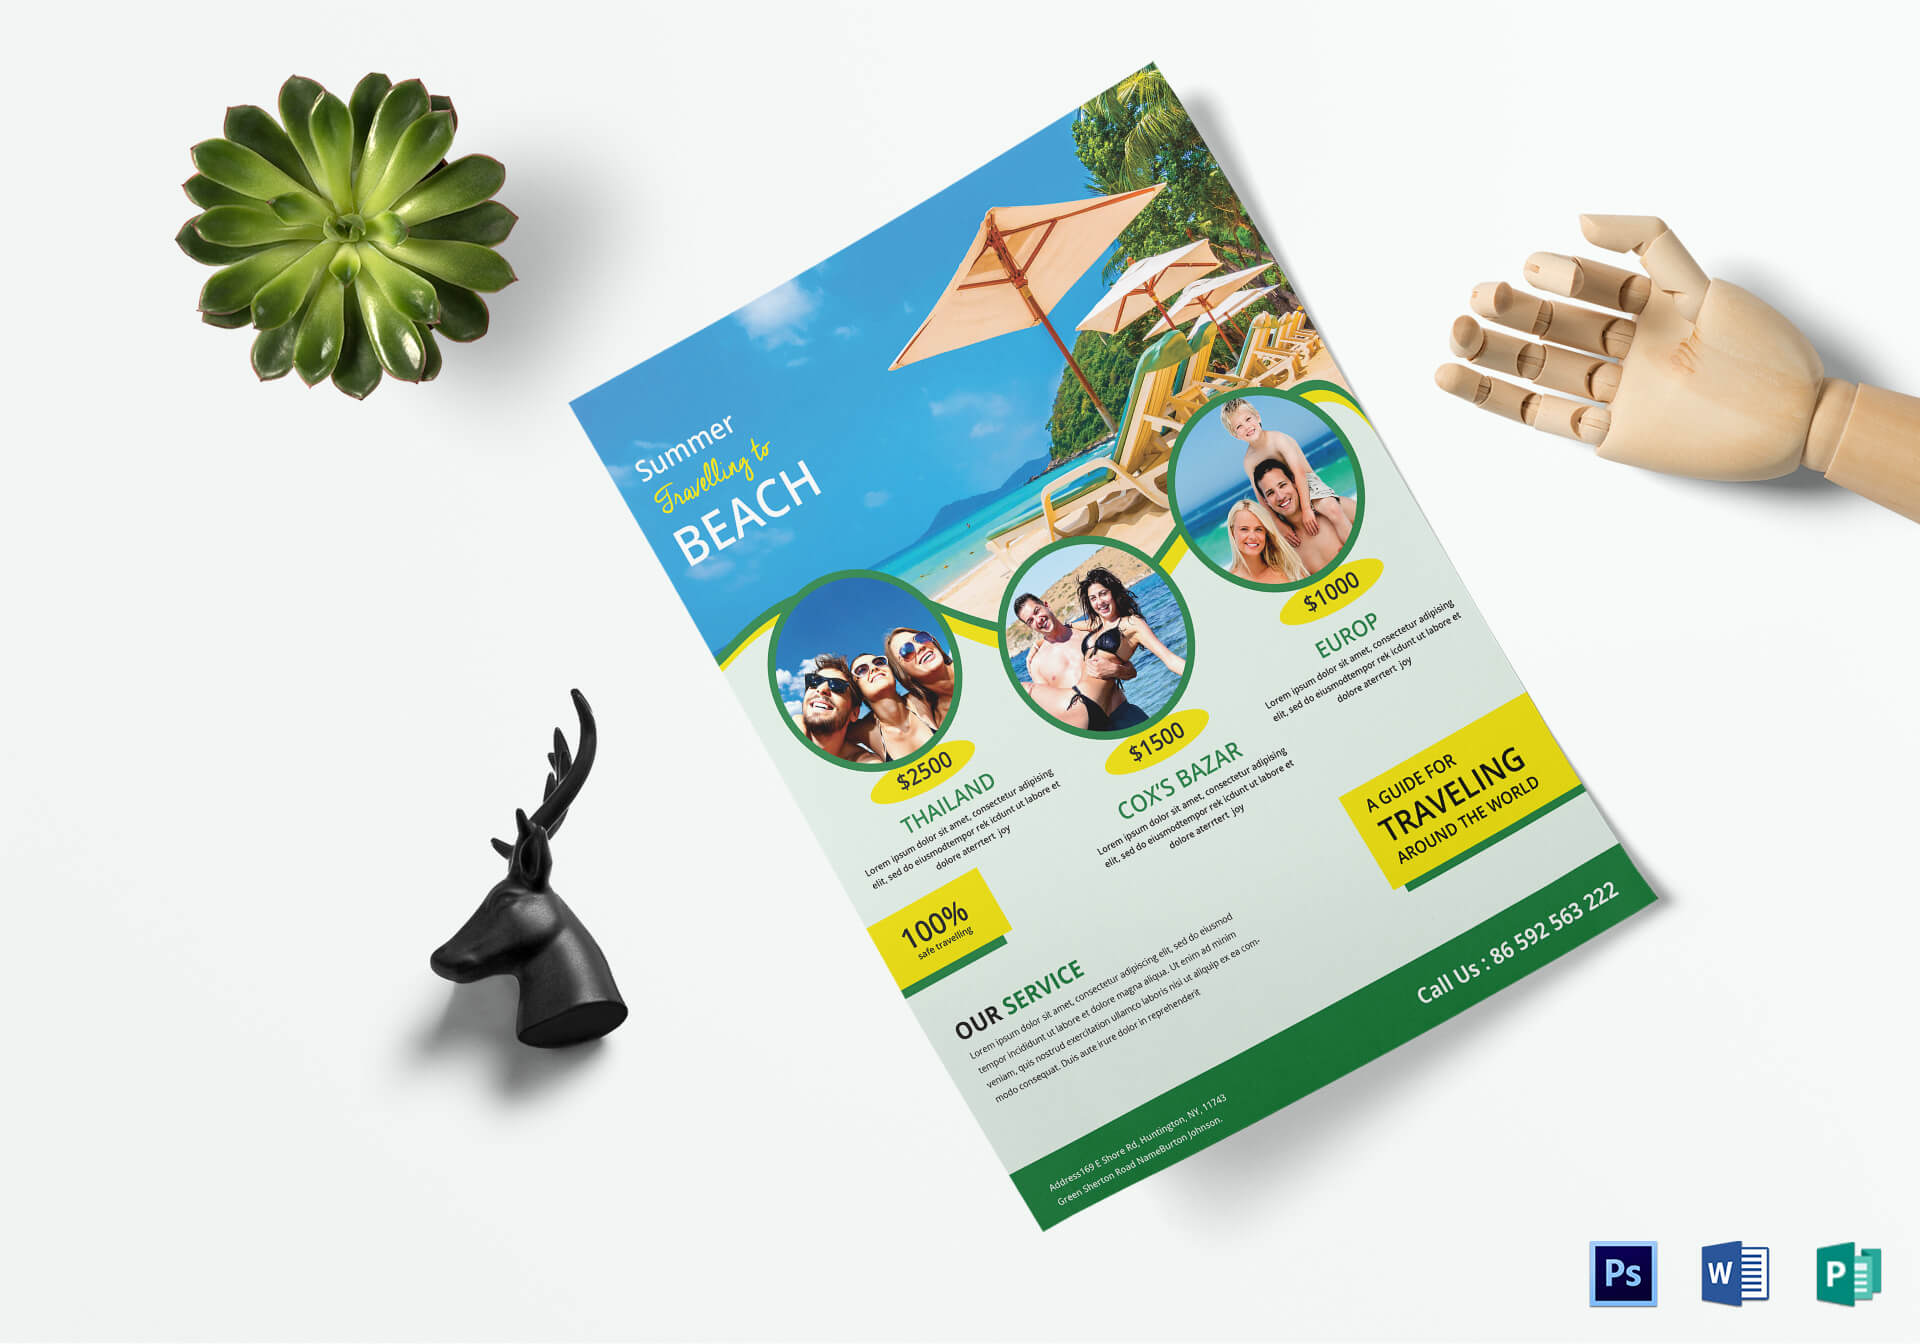 Travel Brochure Design – Tourism Company And Tourism Inside Travel Brochure Template Ks2